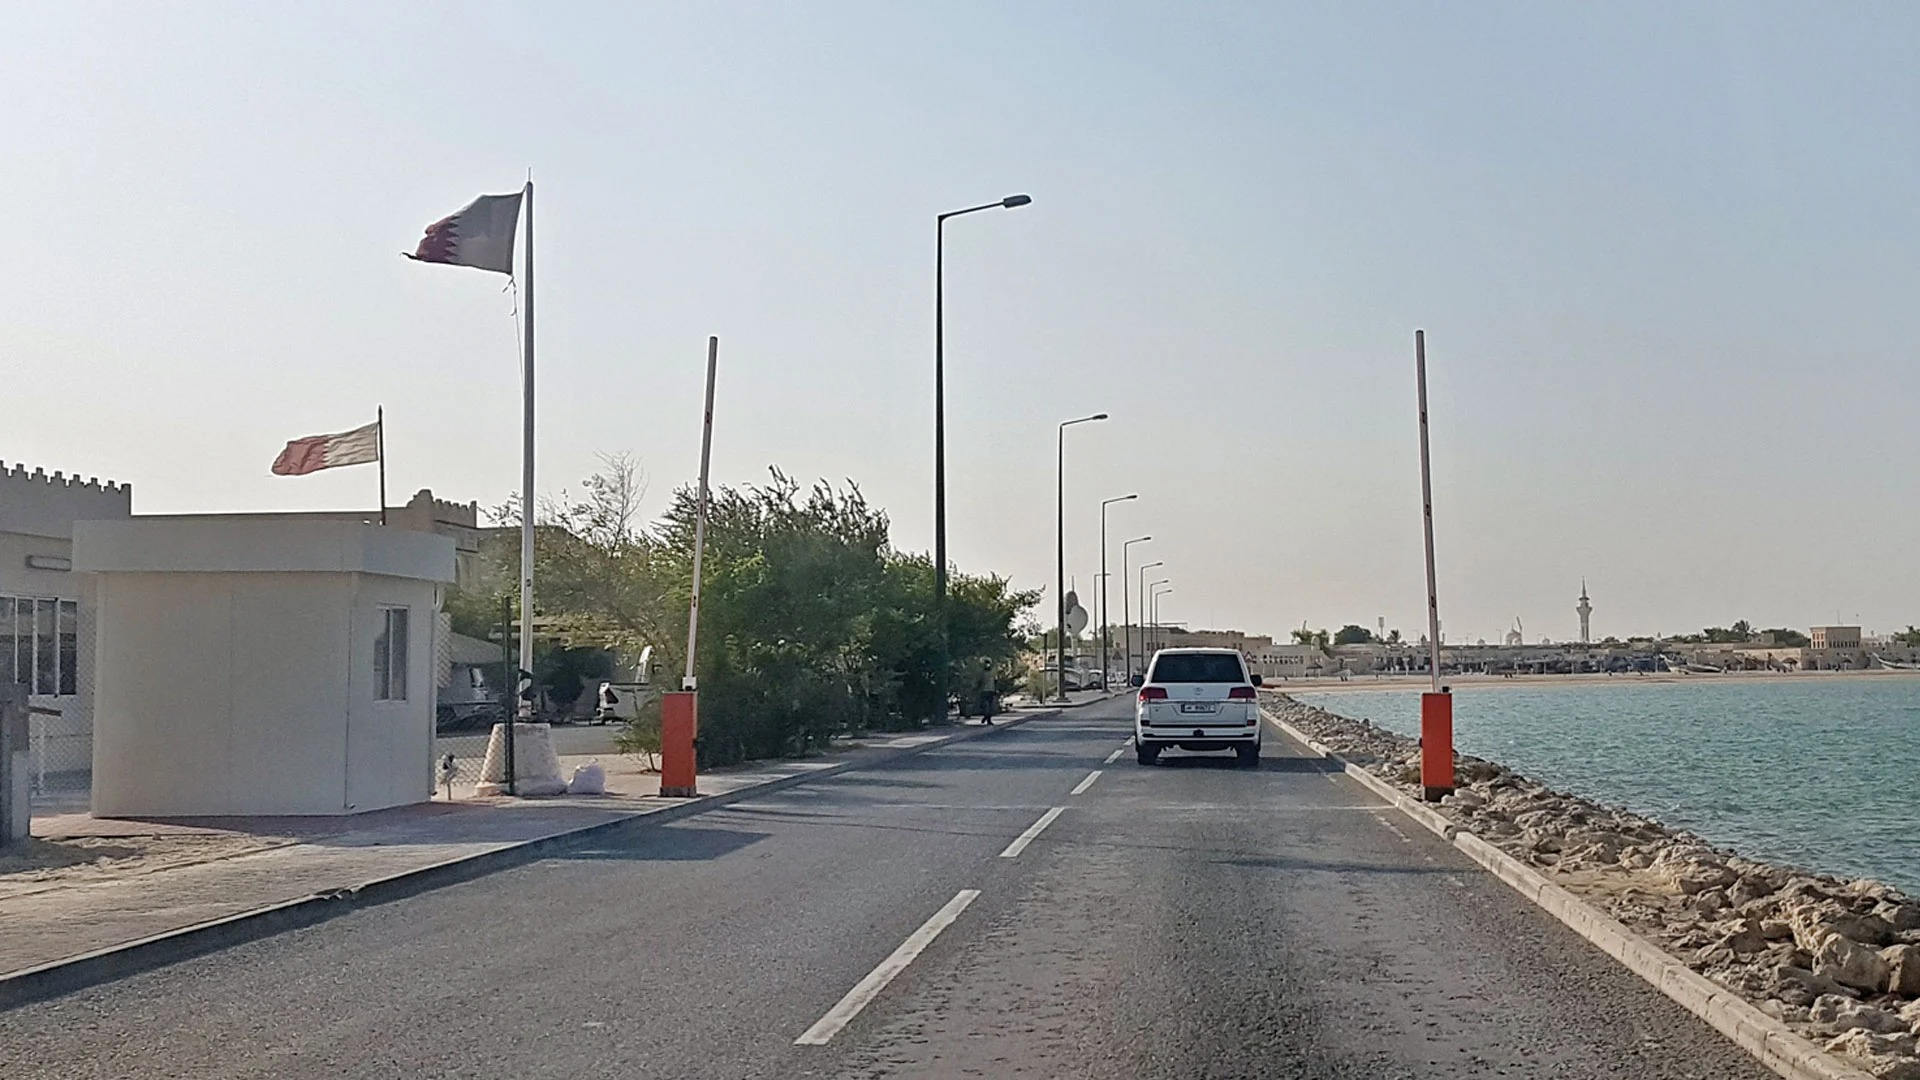 Preventing hikers from entering Al-Wakrah terminal